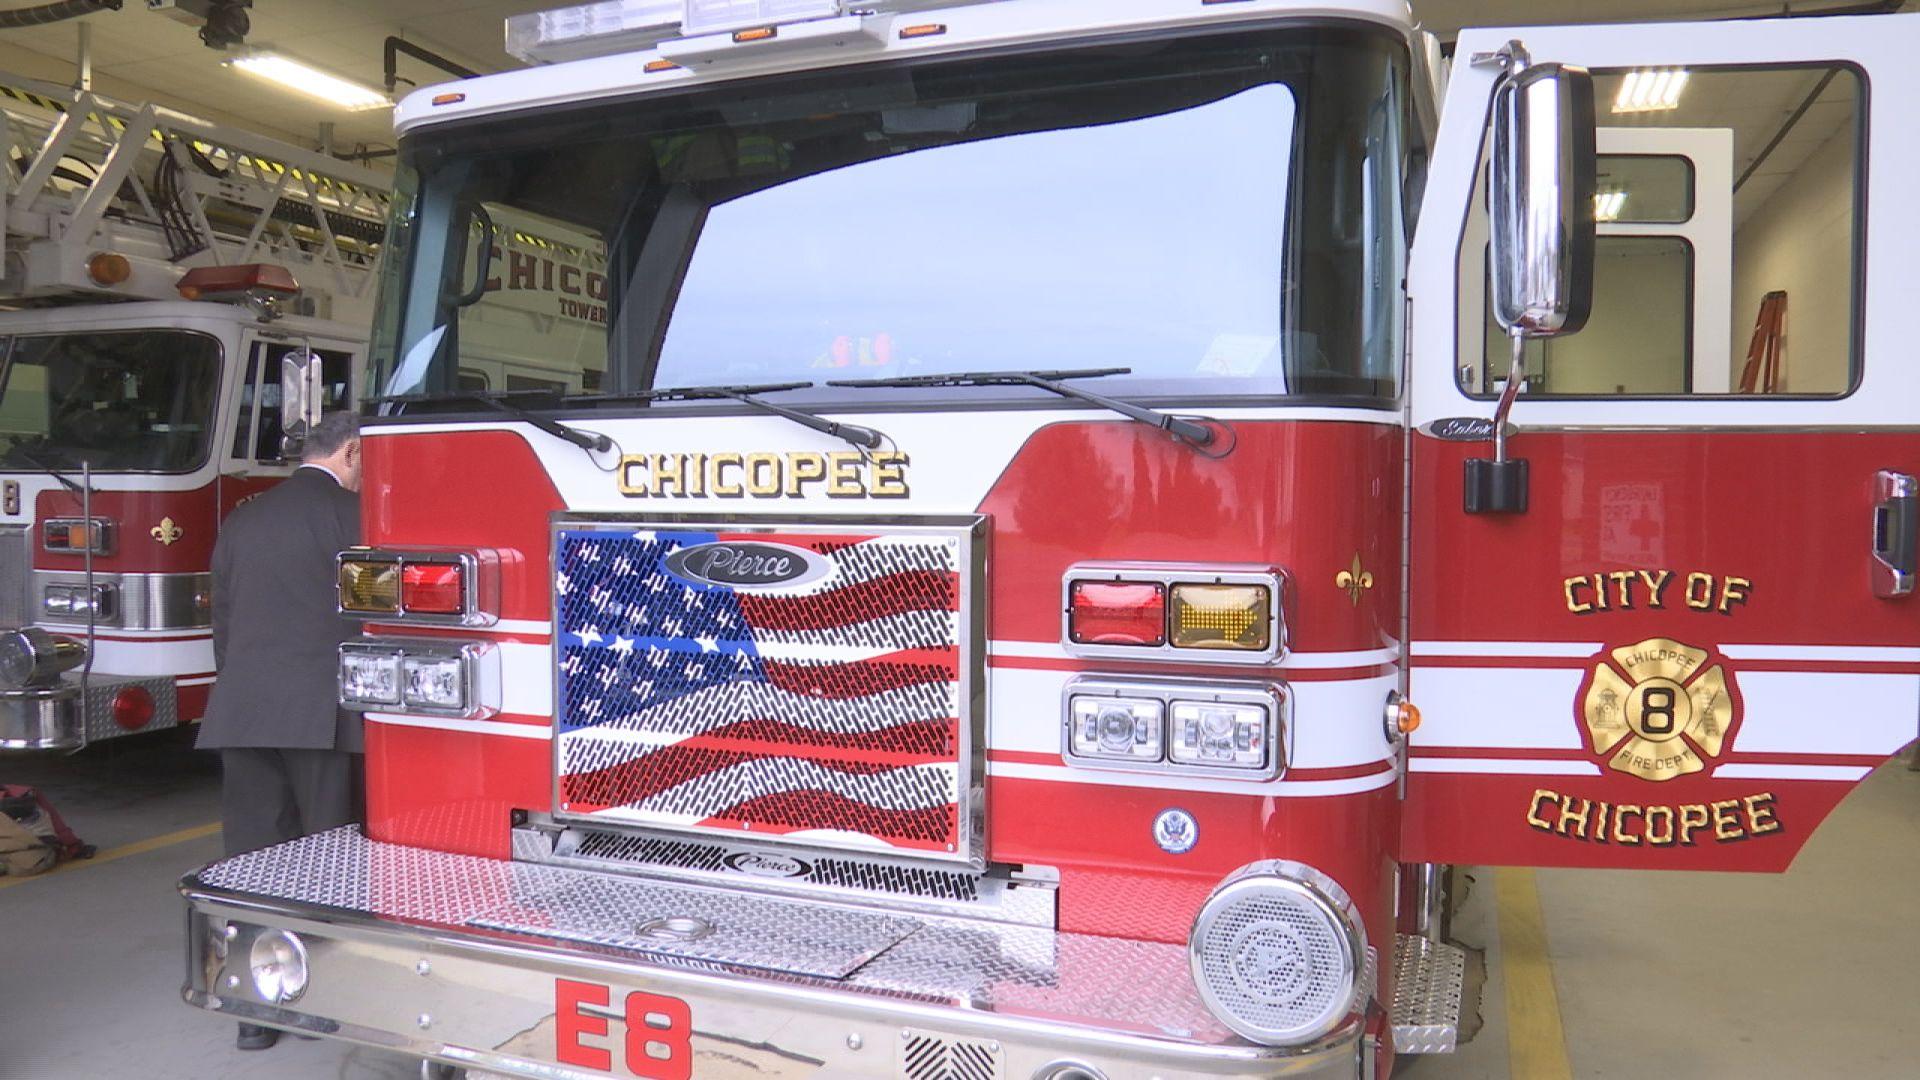 chicopee fire truck_1555619901047.jpg.jpg